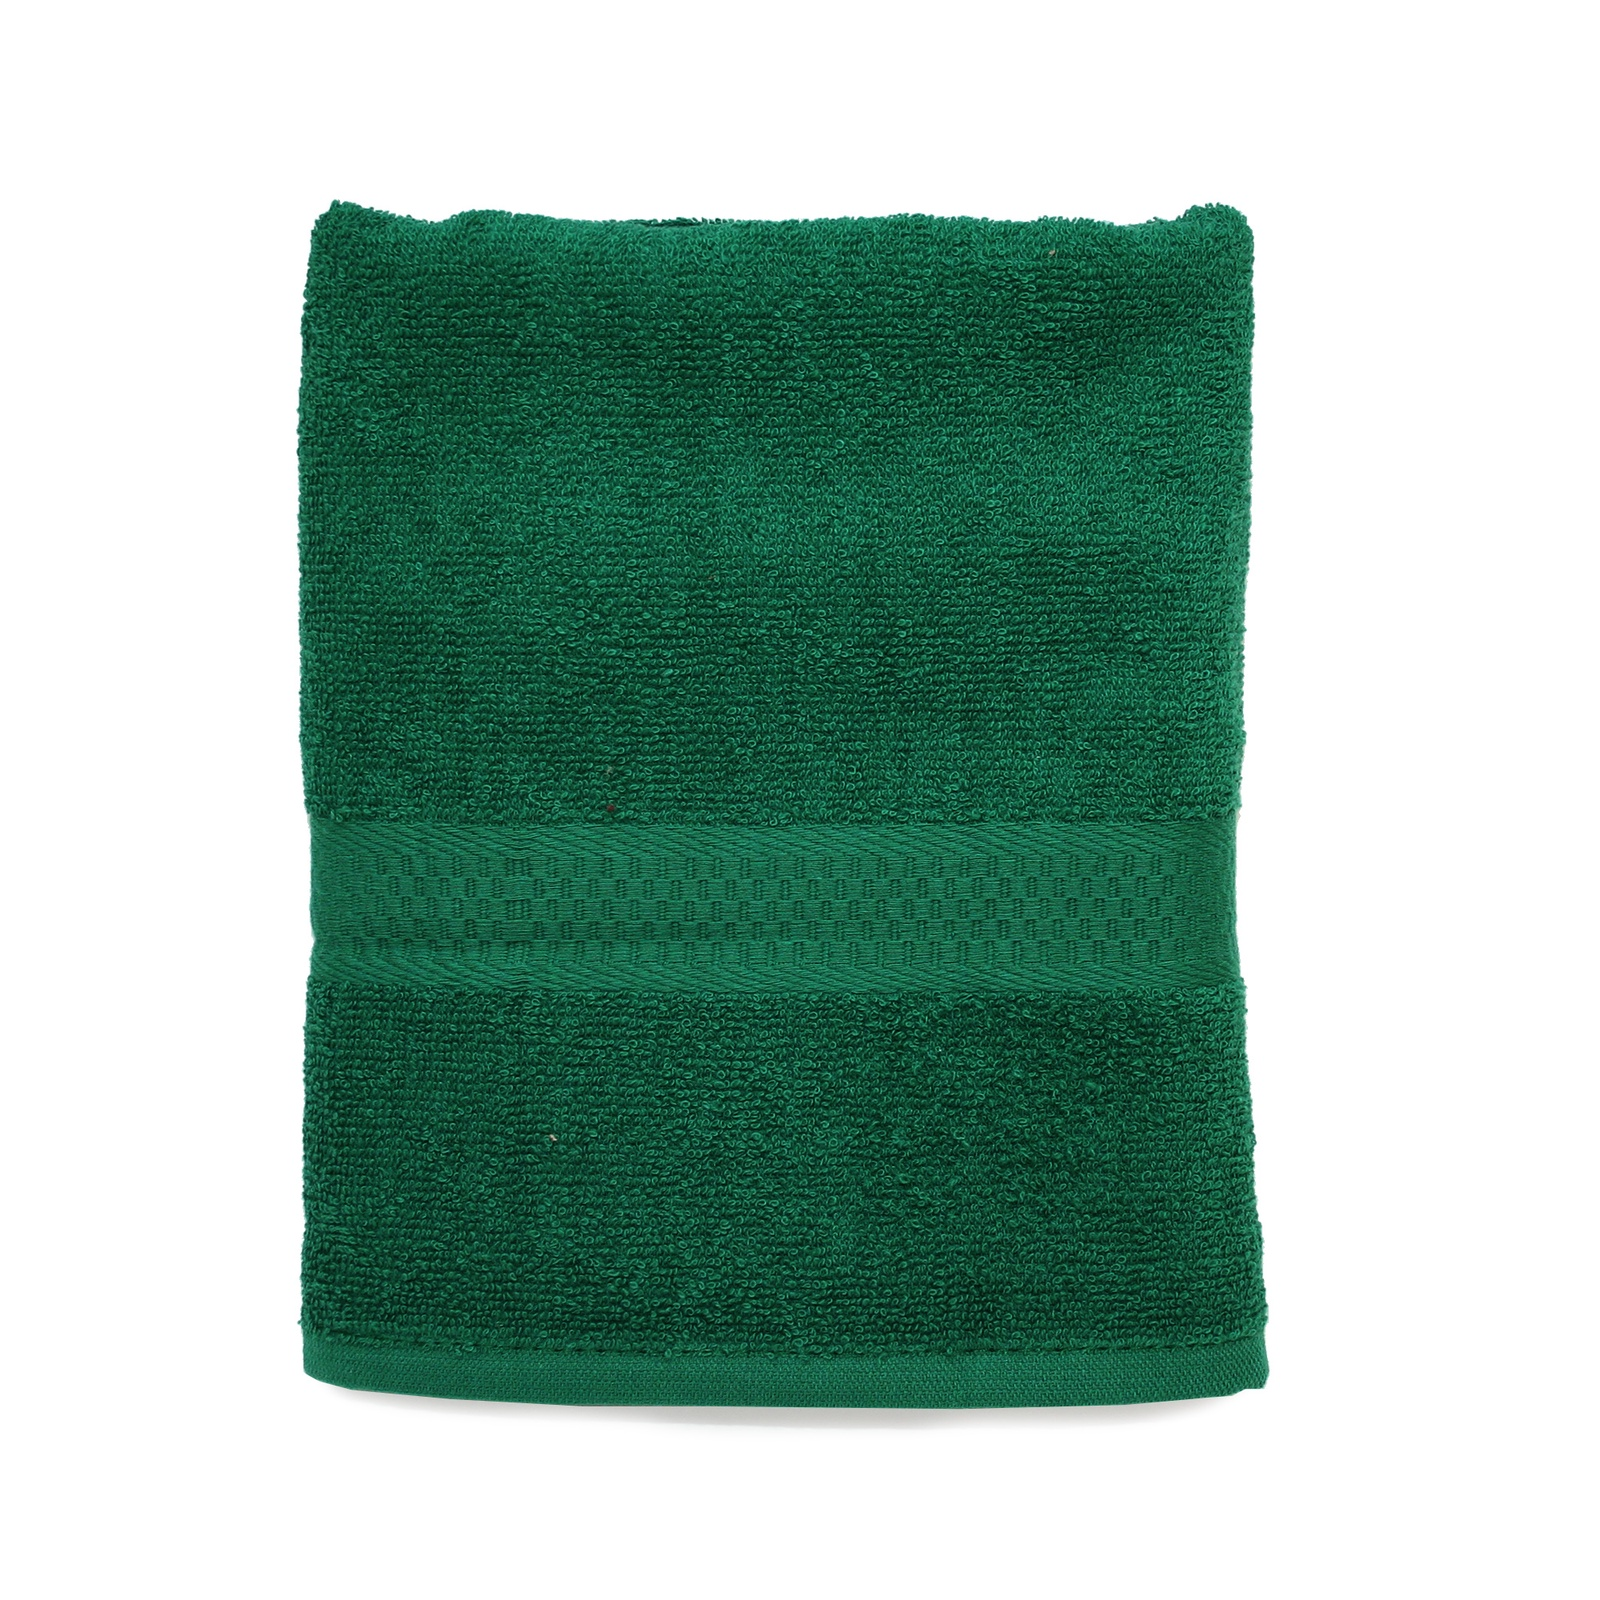 Полотенце банное Spany махровое, 21311318190, зеленый, 130х70 см